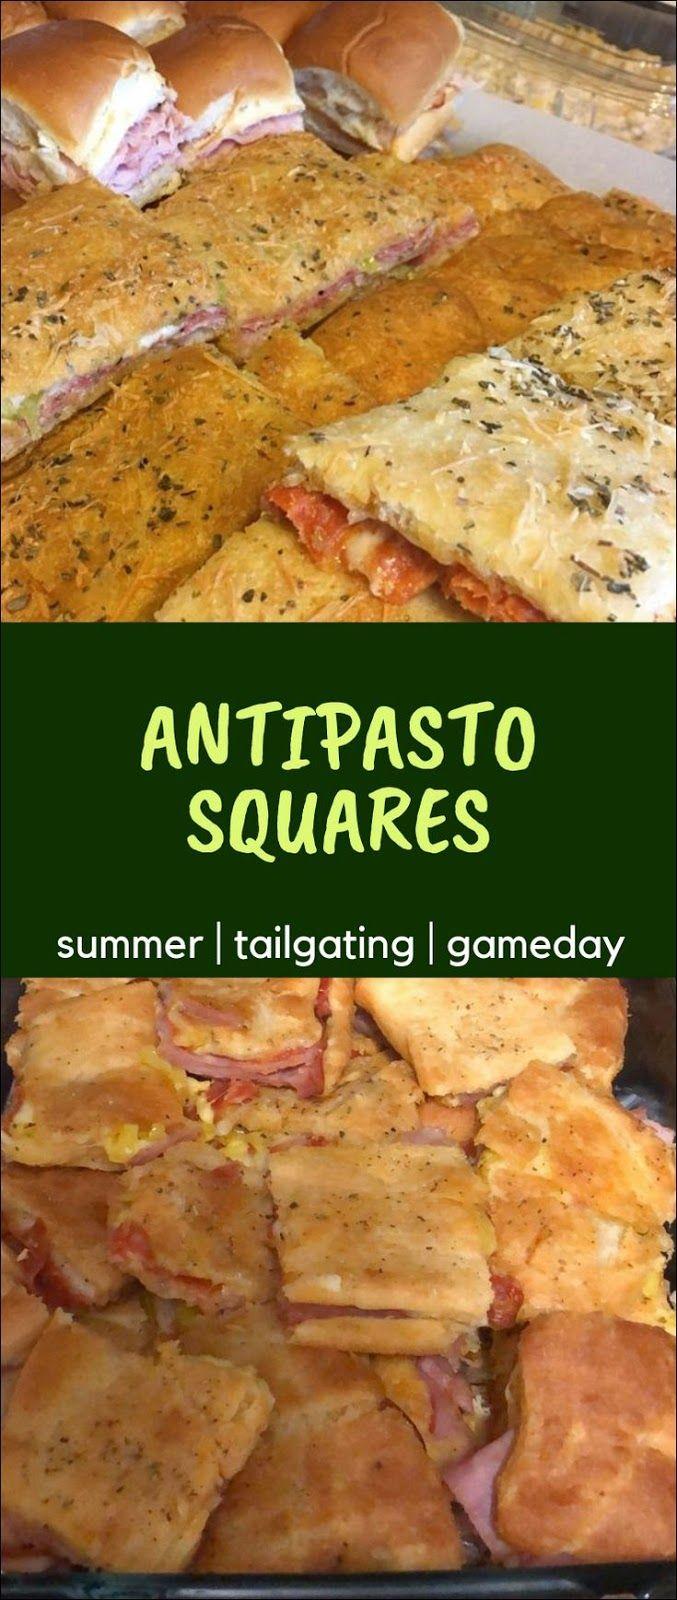 Antipasto Squares